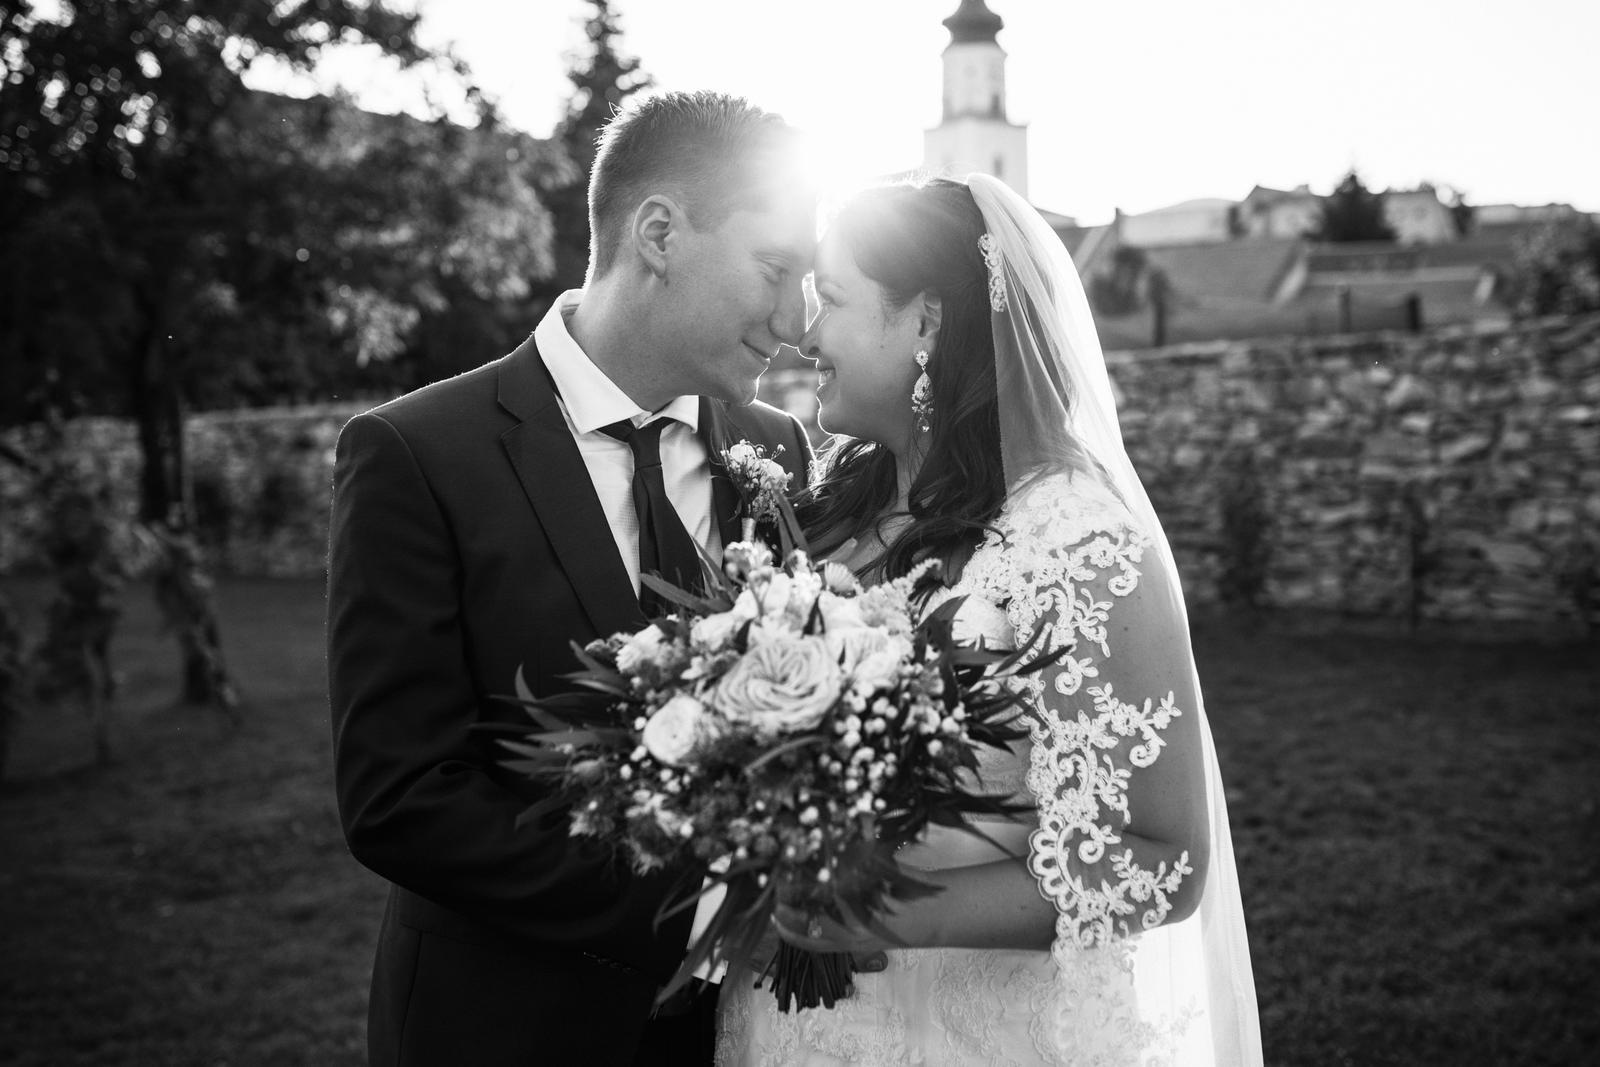 Svadba Lenka & Matej JUN 2019 - Obrázok č. 50